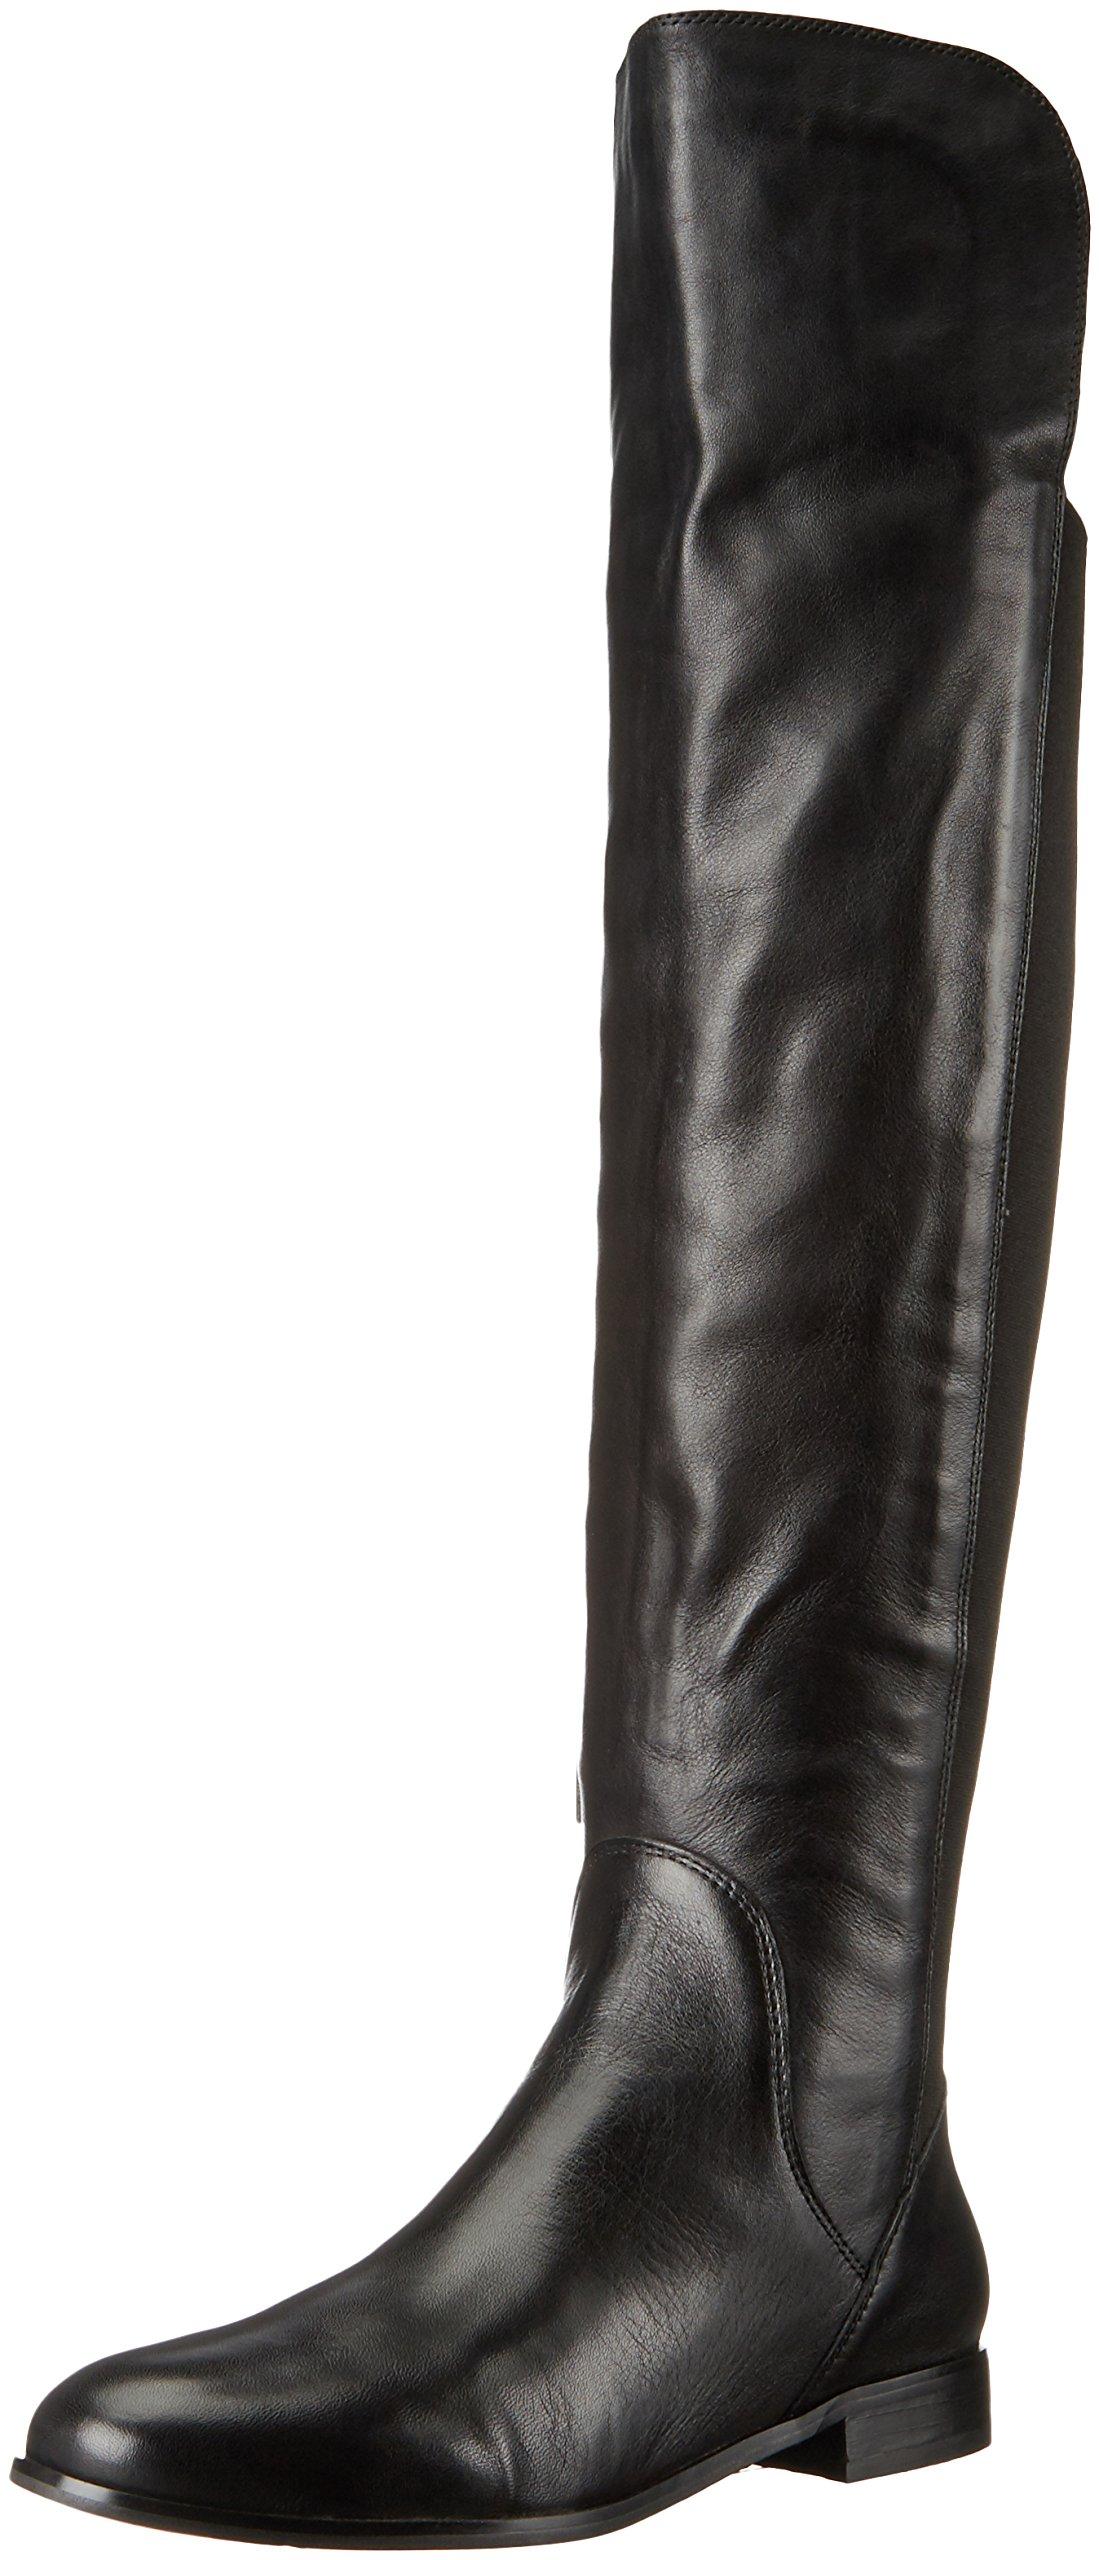 Corso Como Women's Larissa Riding Boot, Black Soft Tumbled Leather, 8 M US by Corso Como